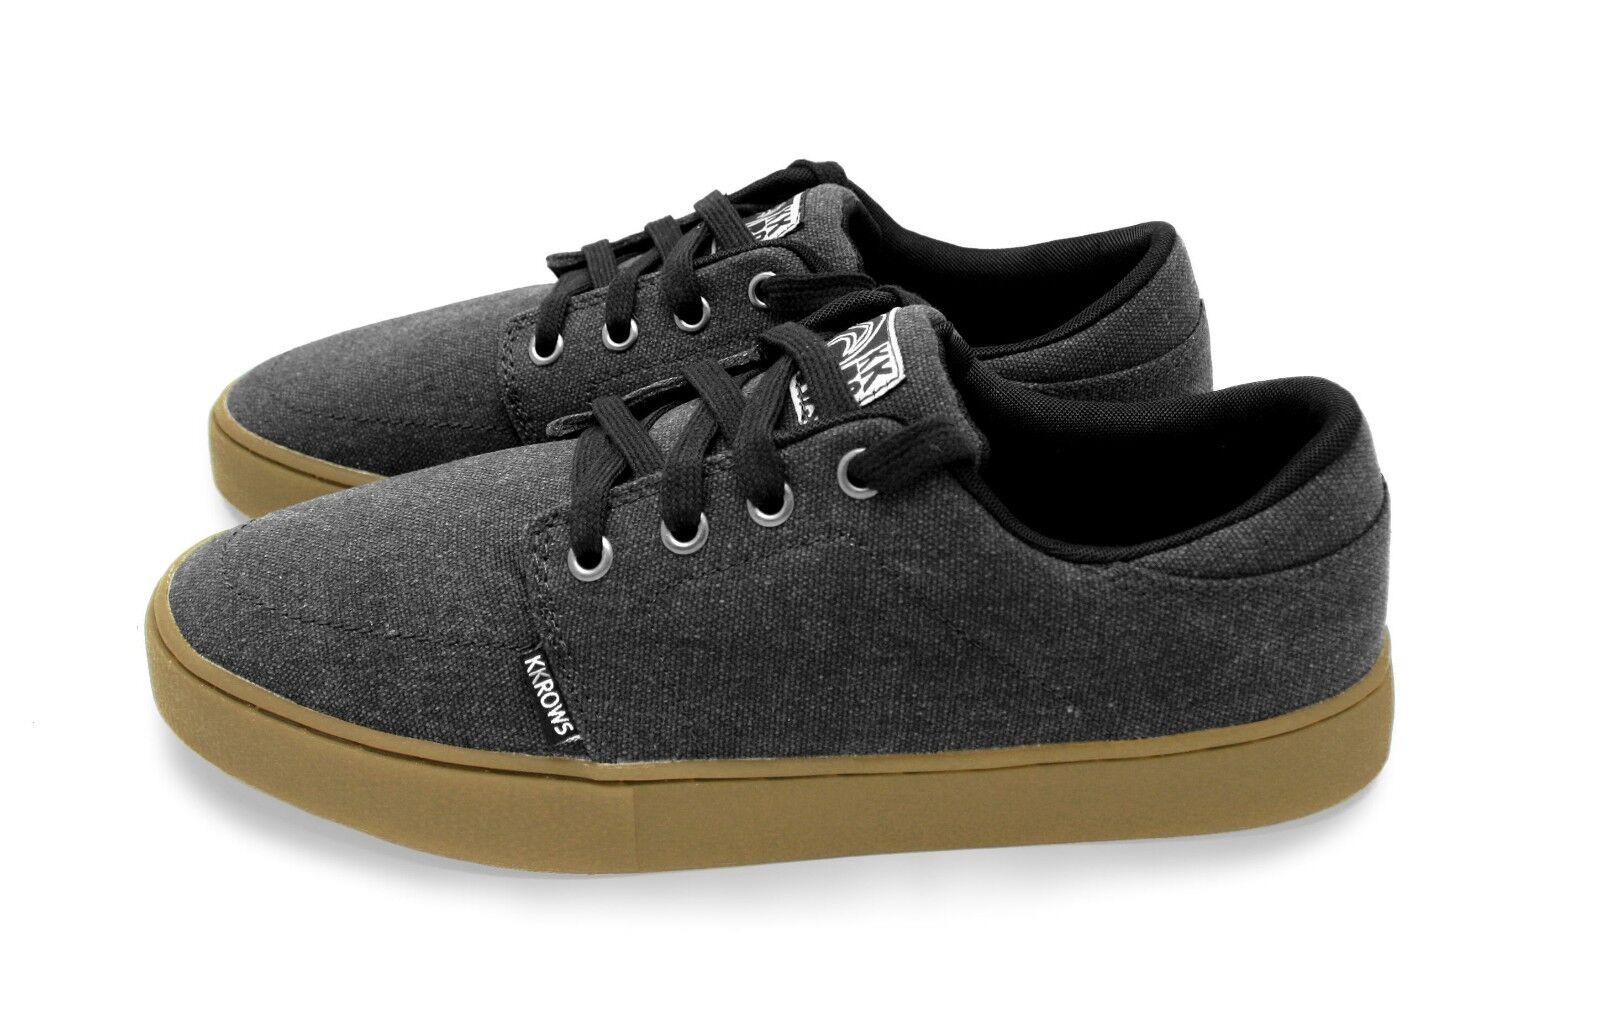 Kemp  chaussures  by kKrows.  noir  / Dark  gris . Skate Casual Low Profile. Girls / femmes